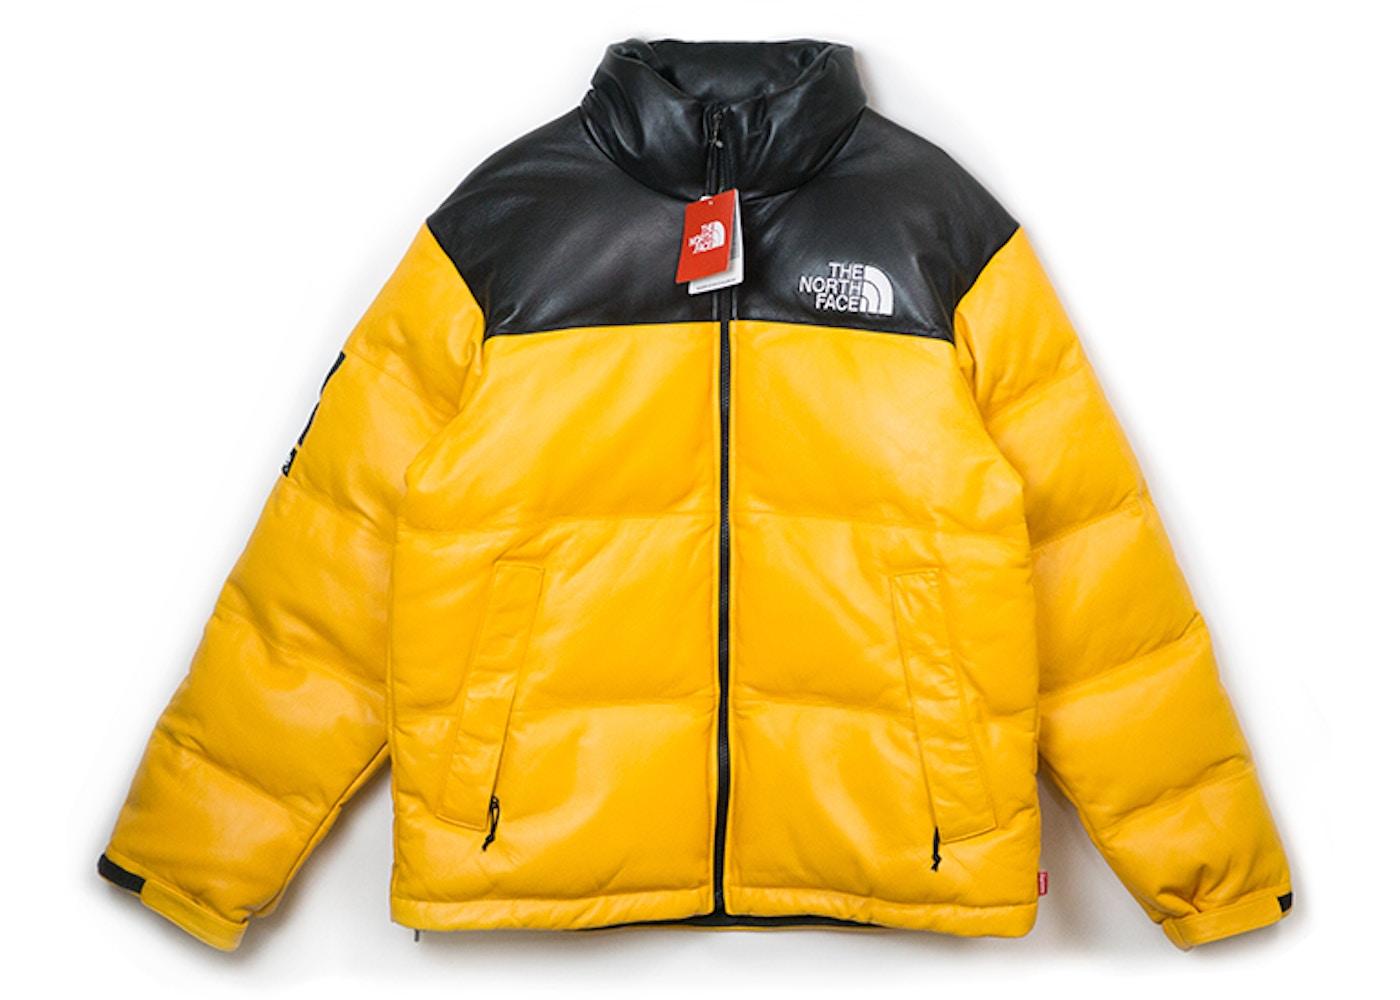 bab5216bf Streetwear - Supreme Jackets - Average Sale Price